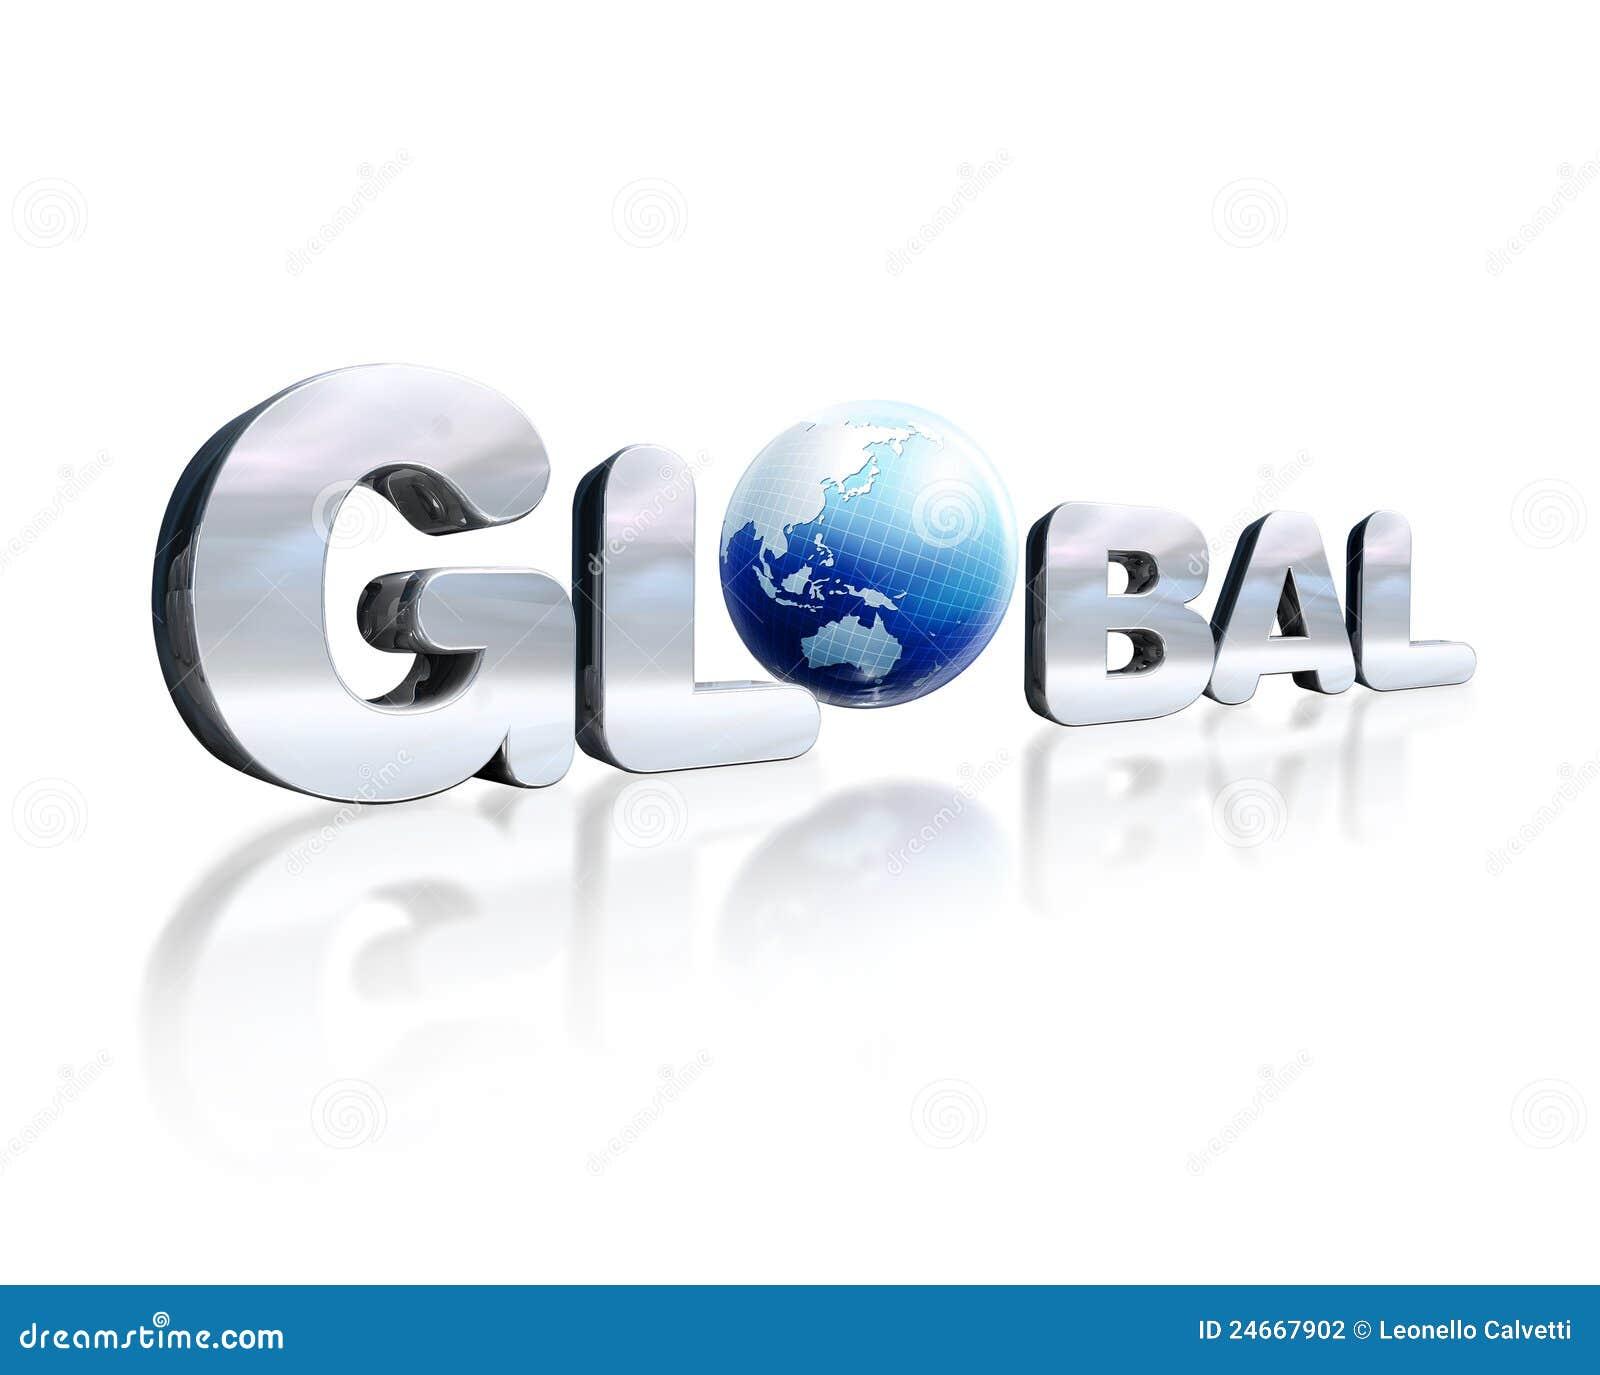 global buzz times milla - photo #31